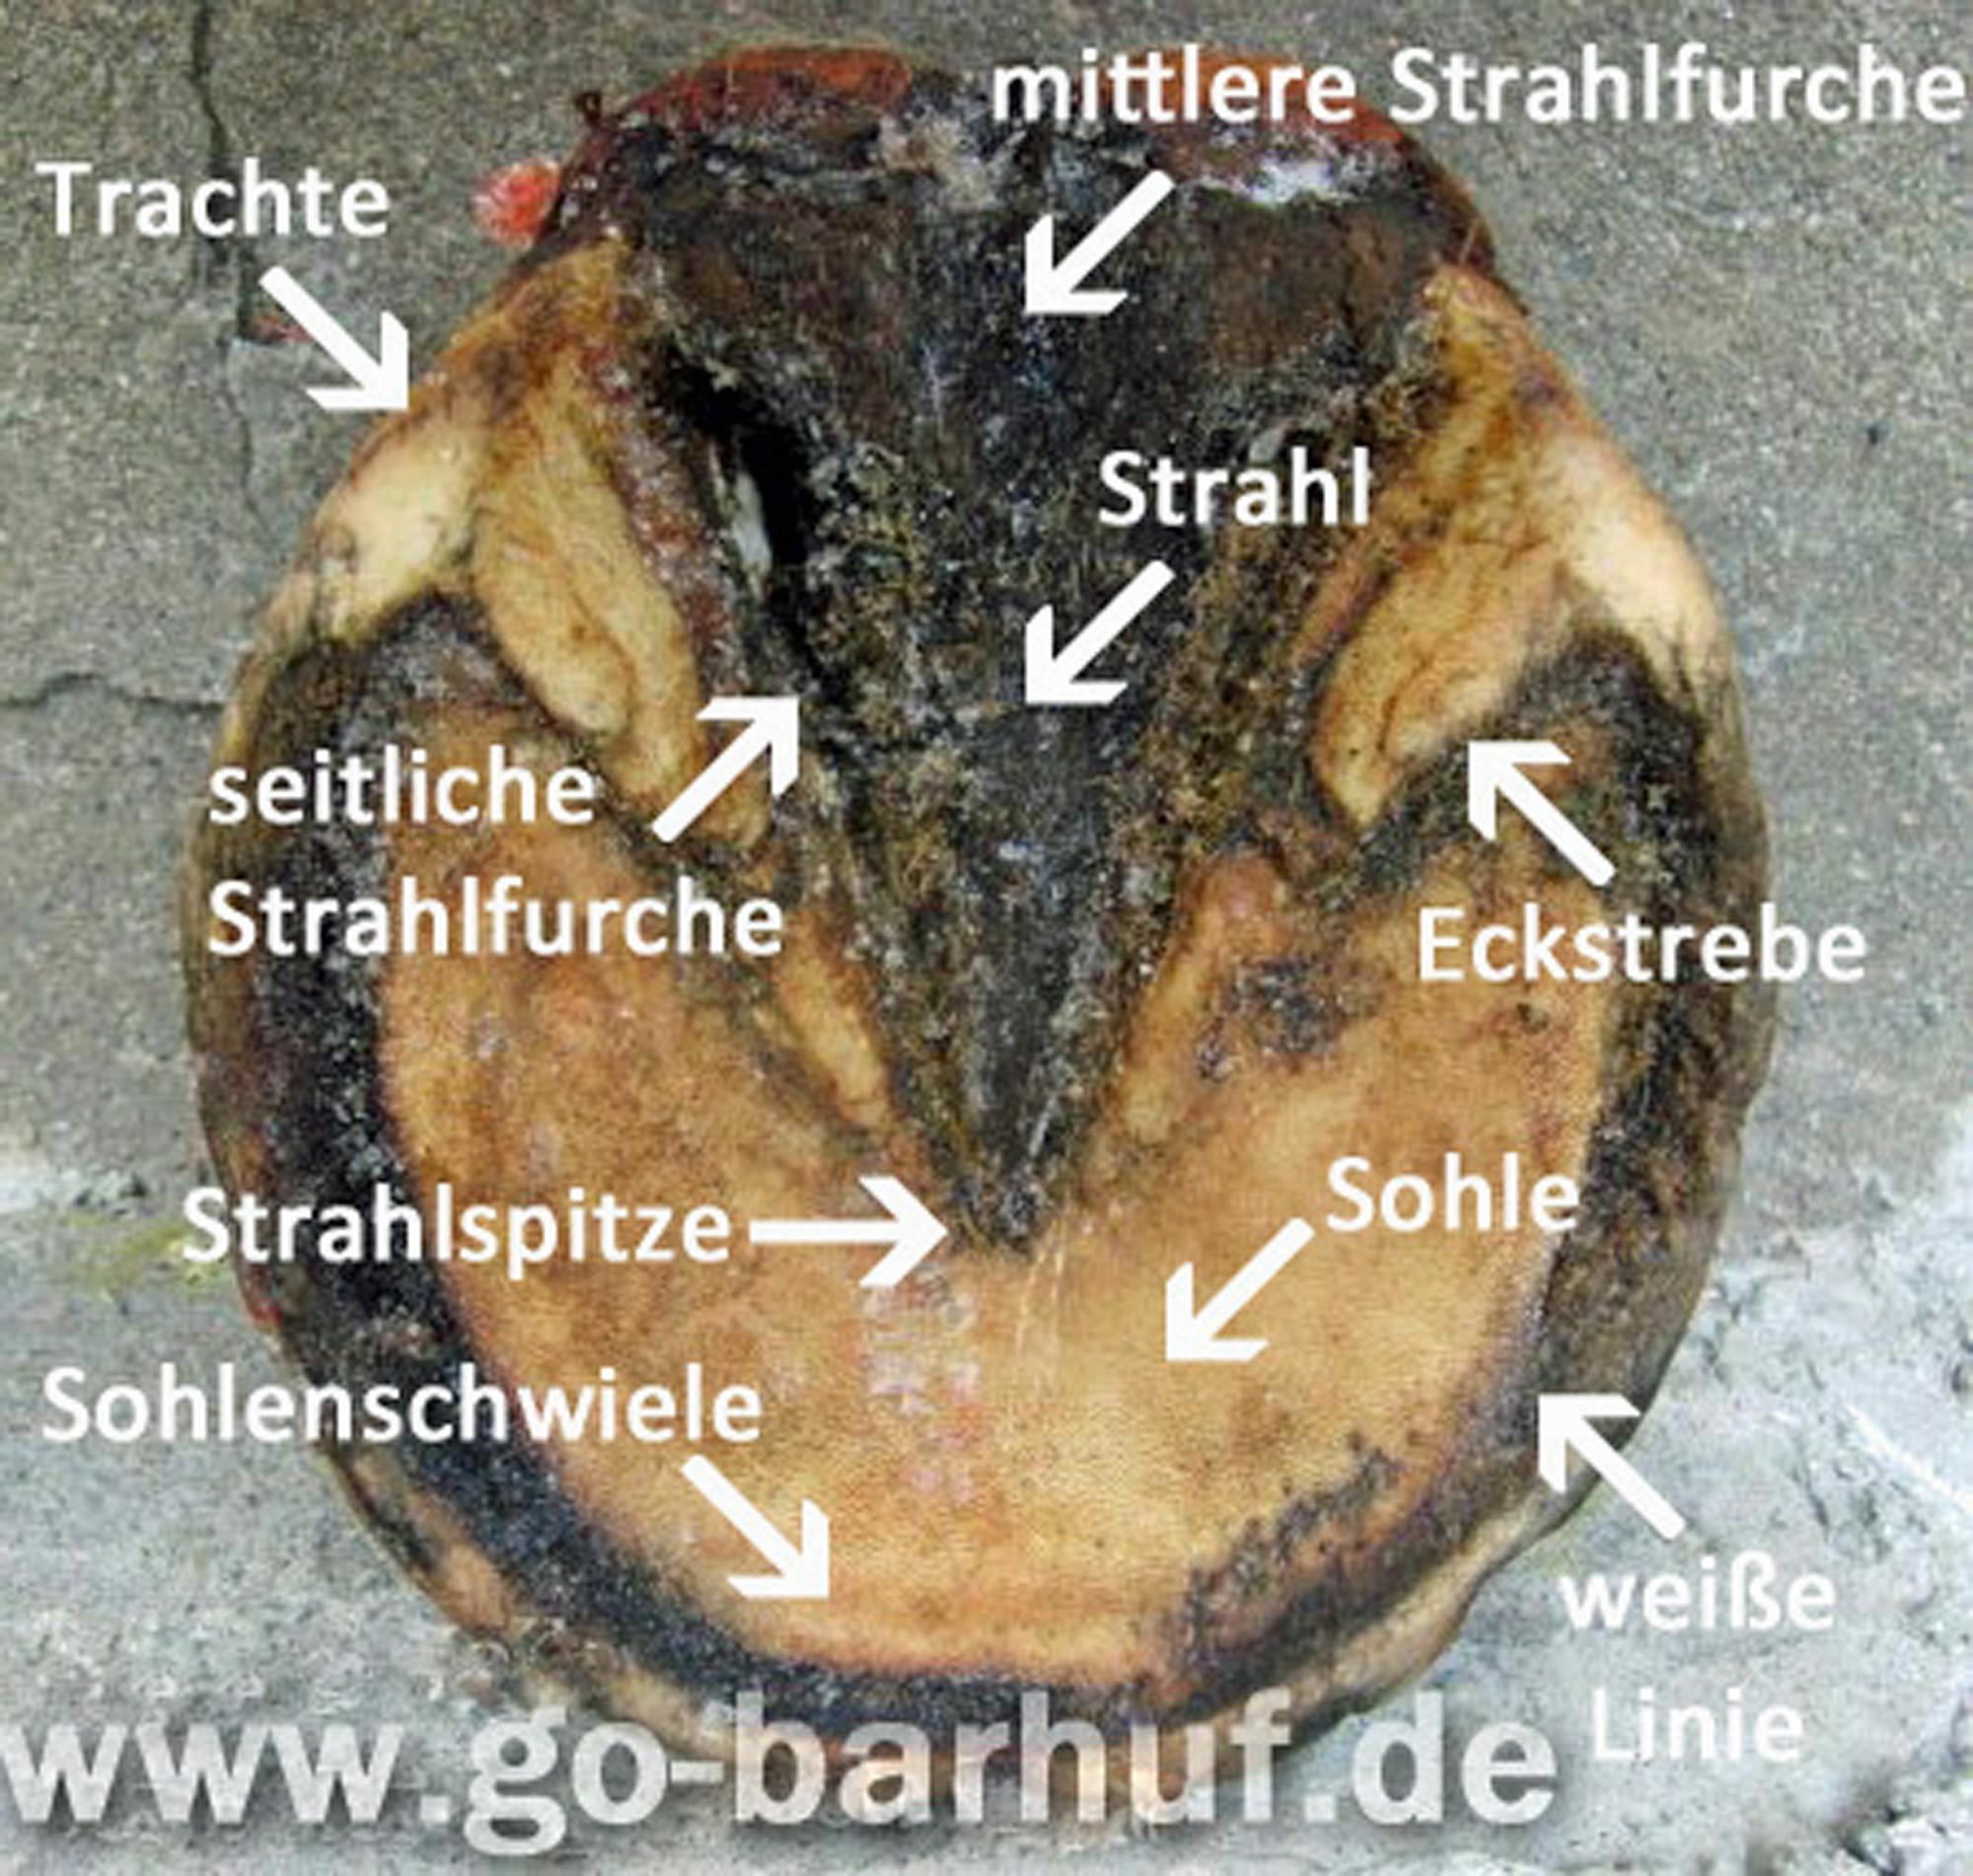 Manu Volk Go-barhuf.de - Der Huf